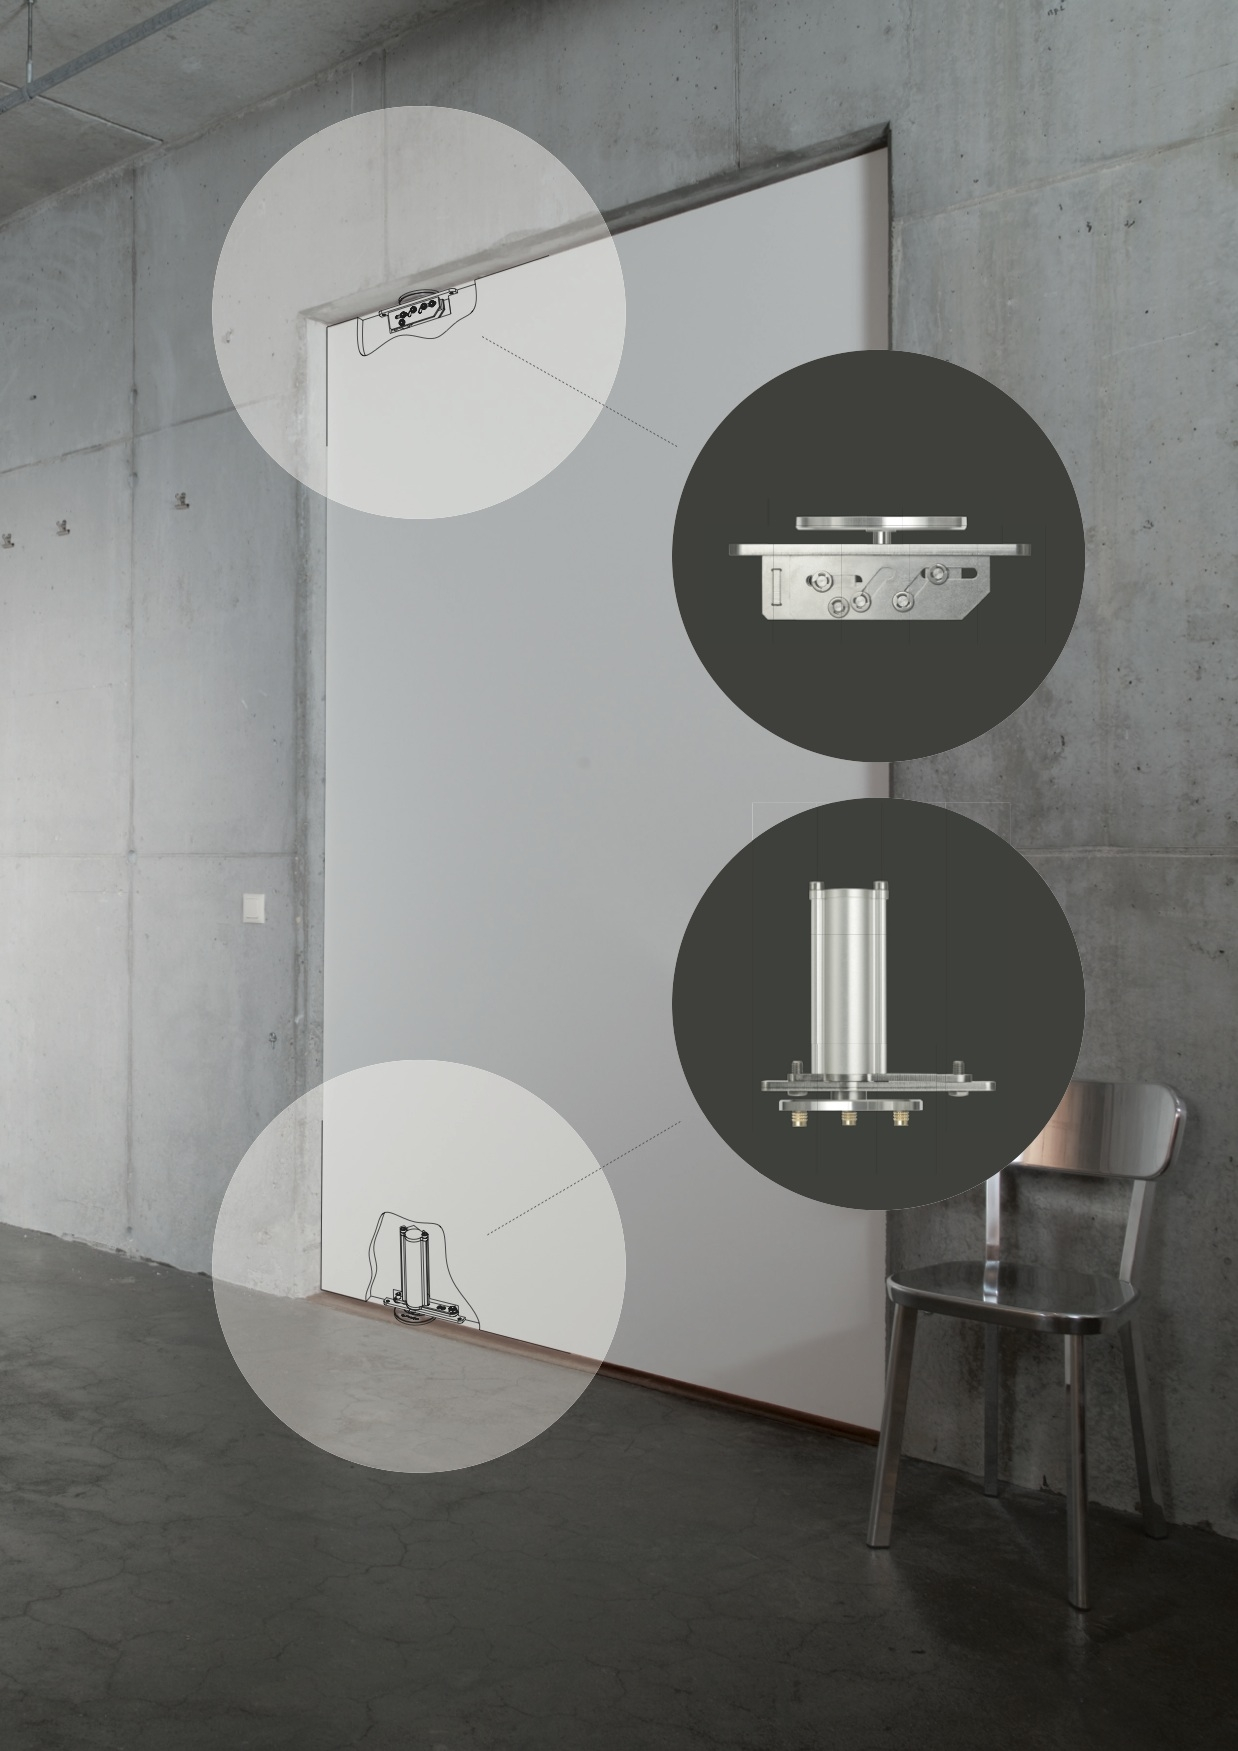 Porte A Bilico By Fritsjurgens Area